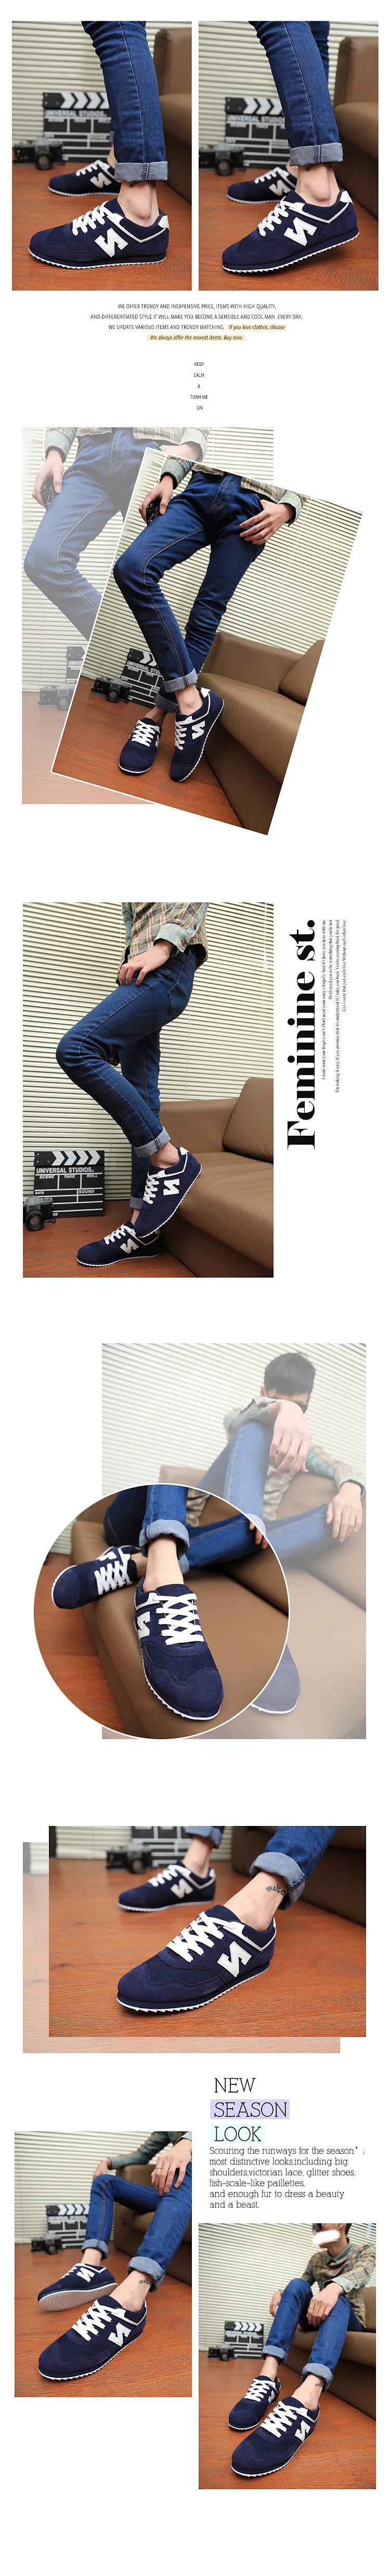 Мужские кроссовки sneaker s124